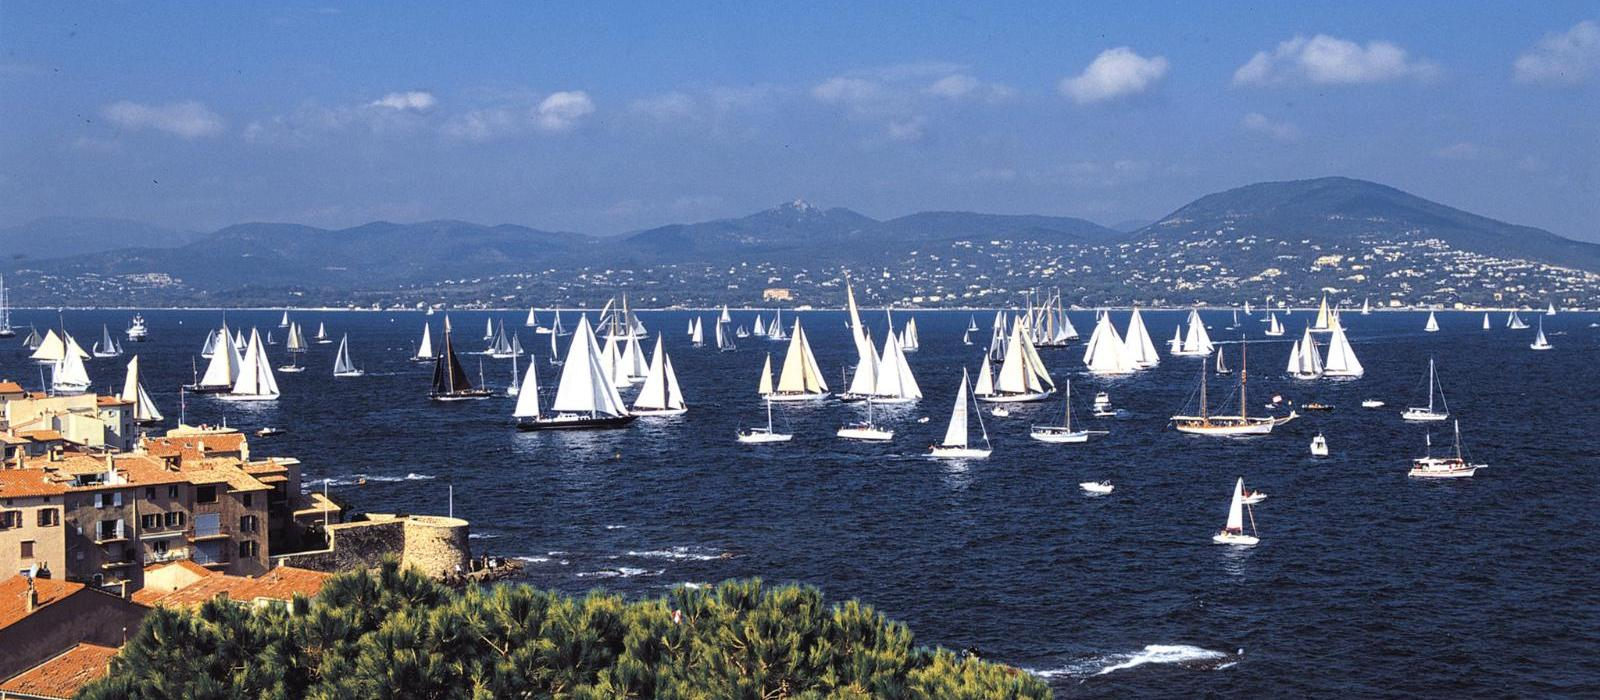 圣特罗佩碧珮乐思酒店(Hotel Byblos Saint-Tropez) 海滩帆船图片  www.lhw.cn